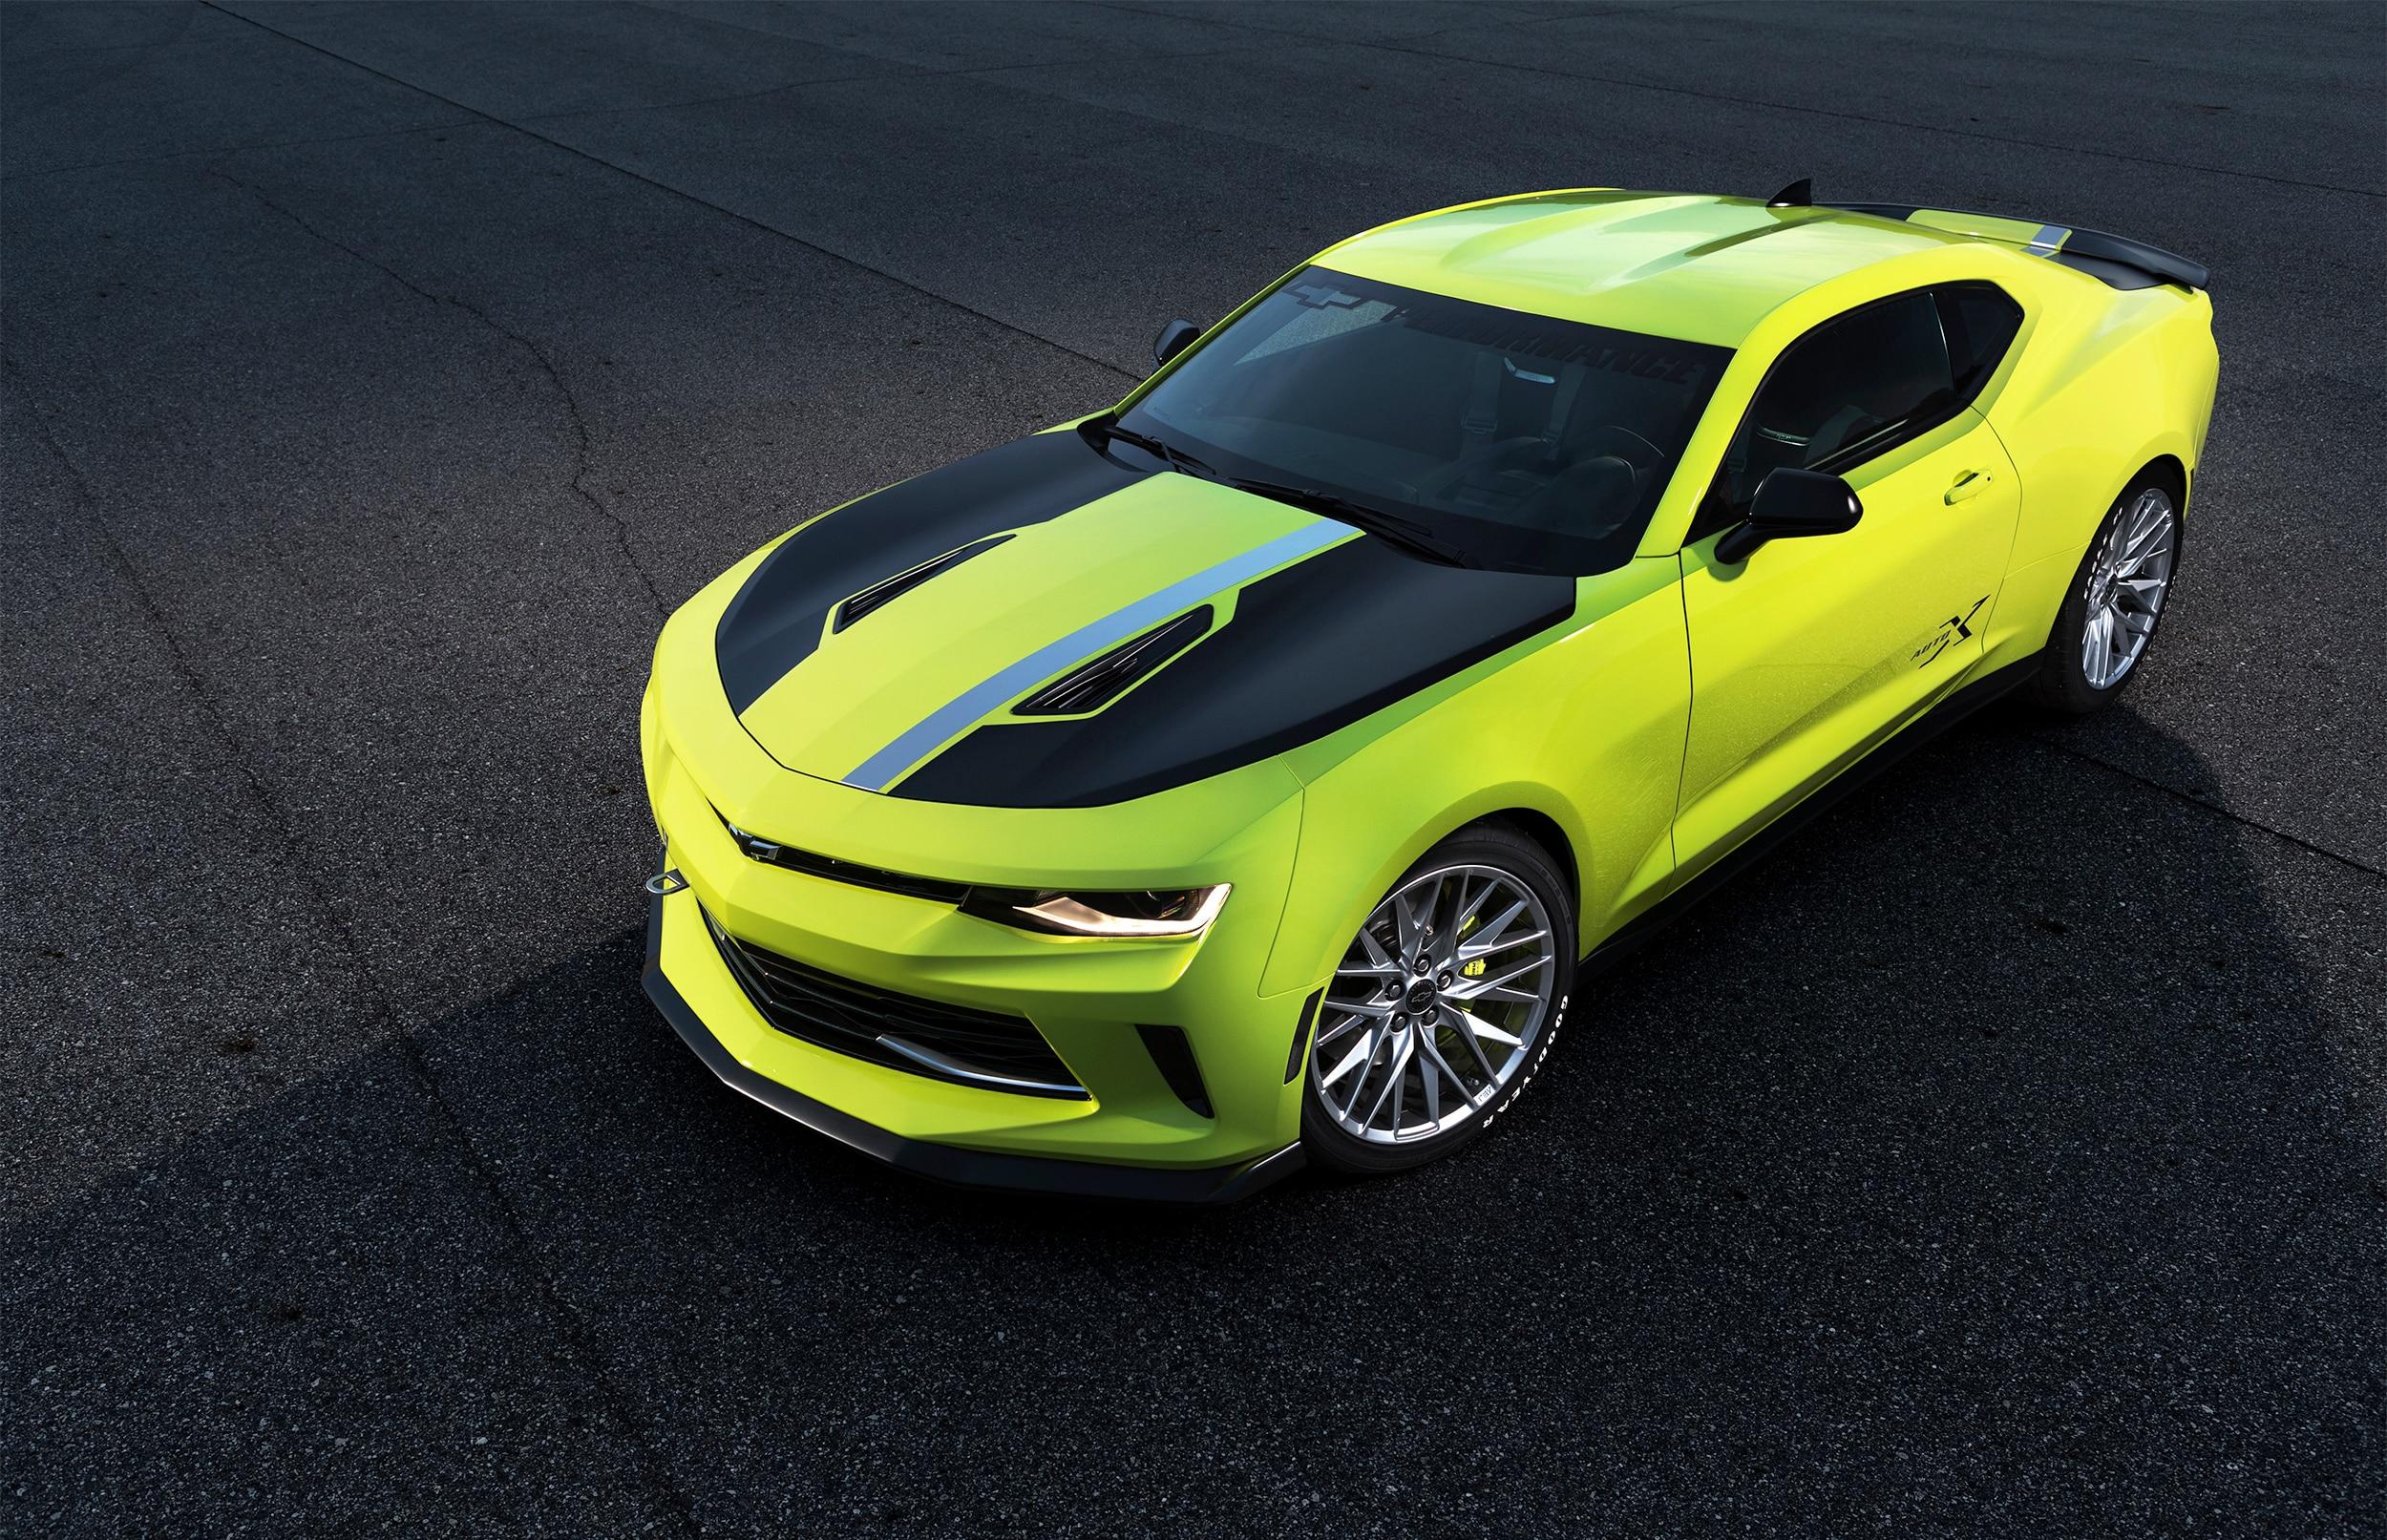 Chevrolet Camaro Turbo AutoX Concept 2016 SEMA Top View